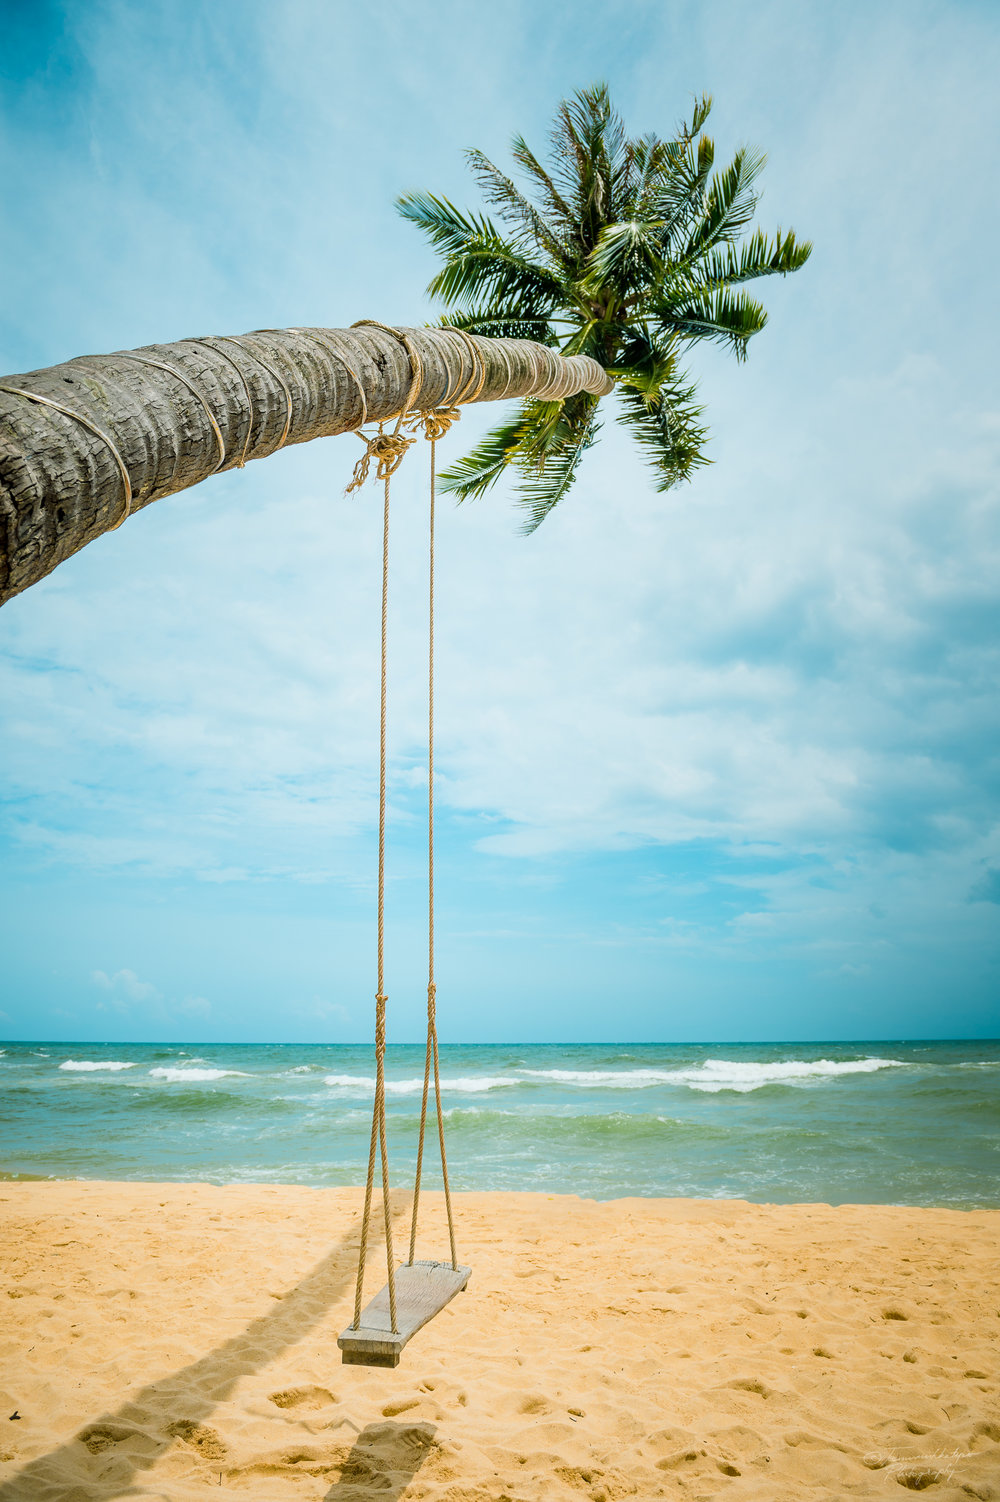 A Swinging beach